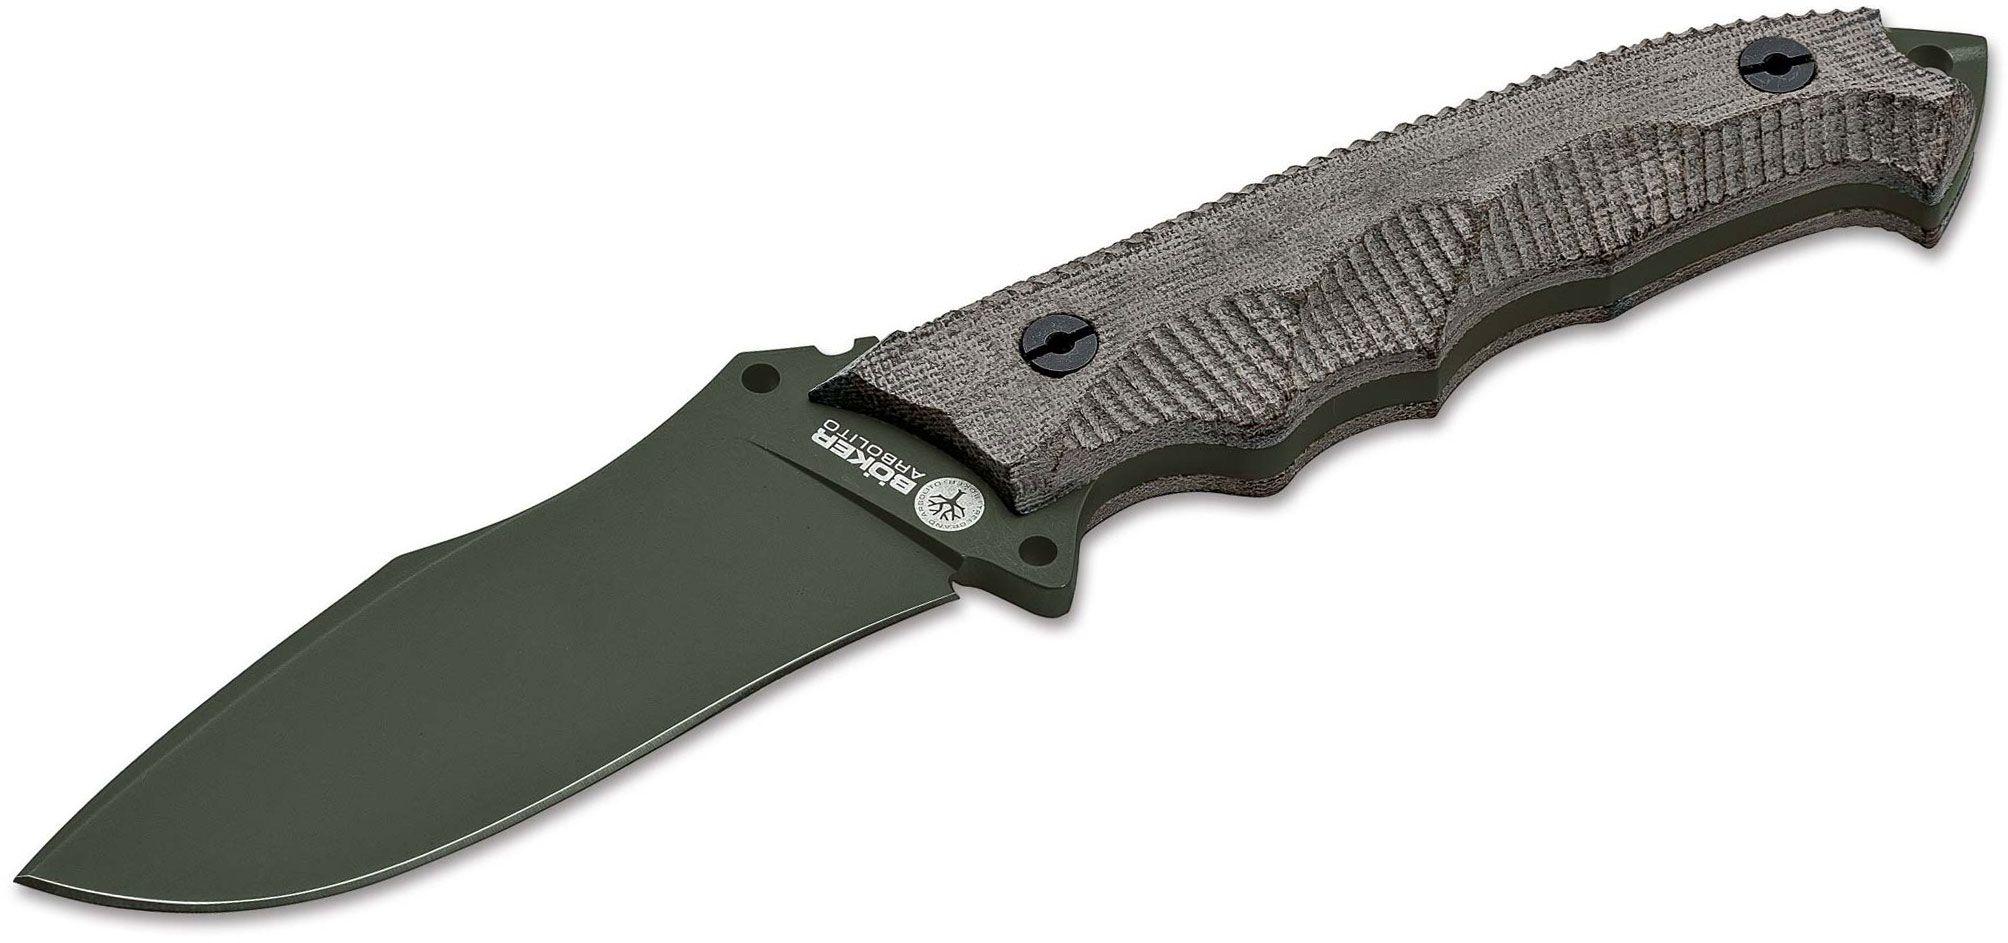 Boker Arbolito Buffalo Soul 42 Fixed 3.98 inch N695 Green Drop Point Blade, Green Micarta Handles, Leather Sheath